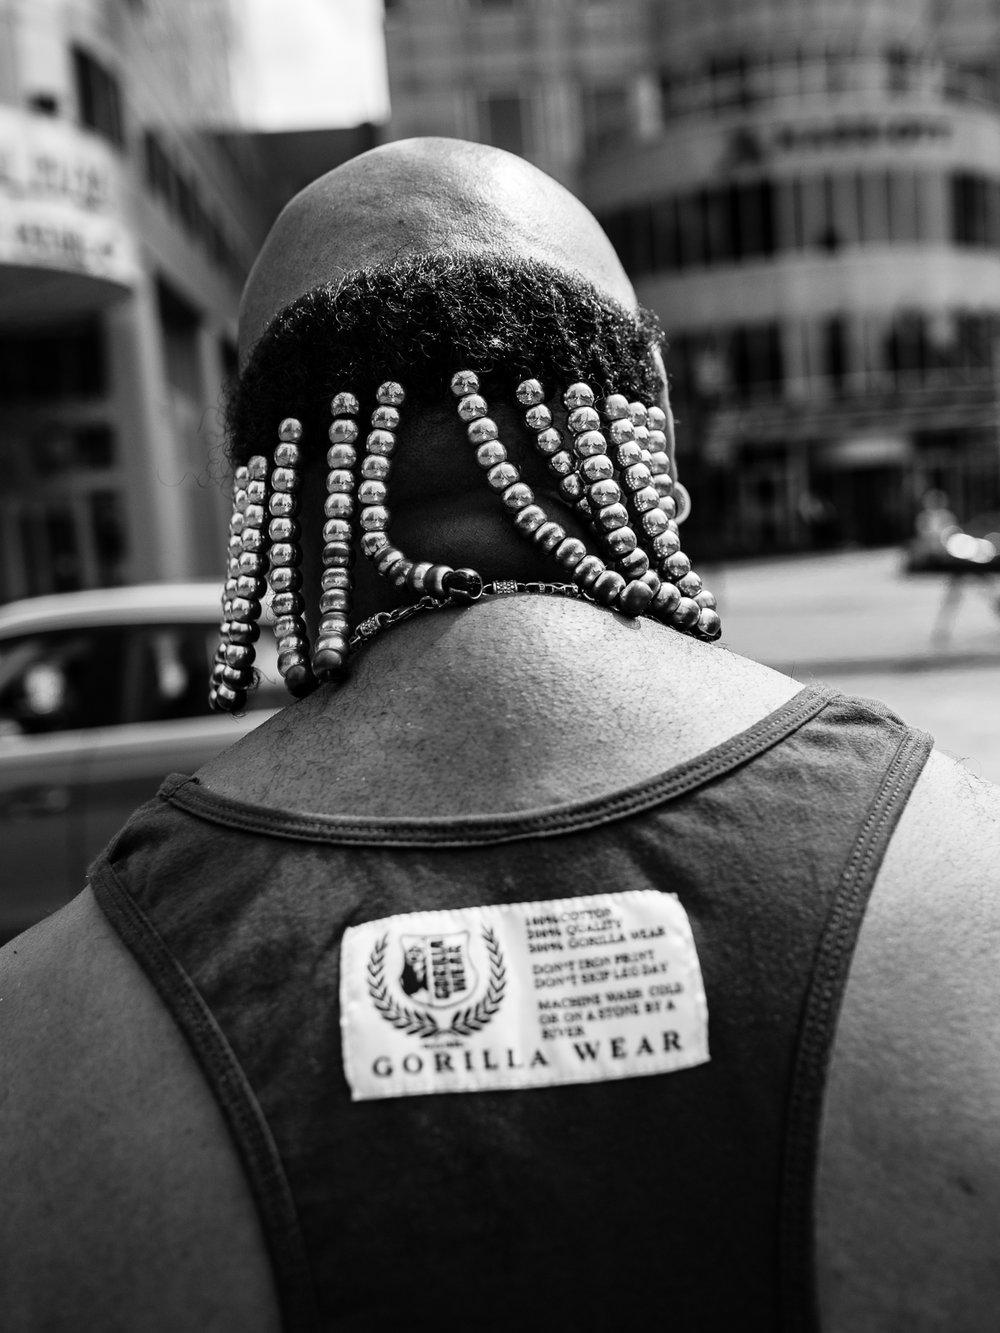 fokko muller street photography - 180804 - 005.jpg